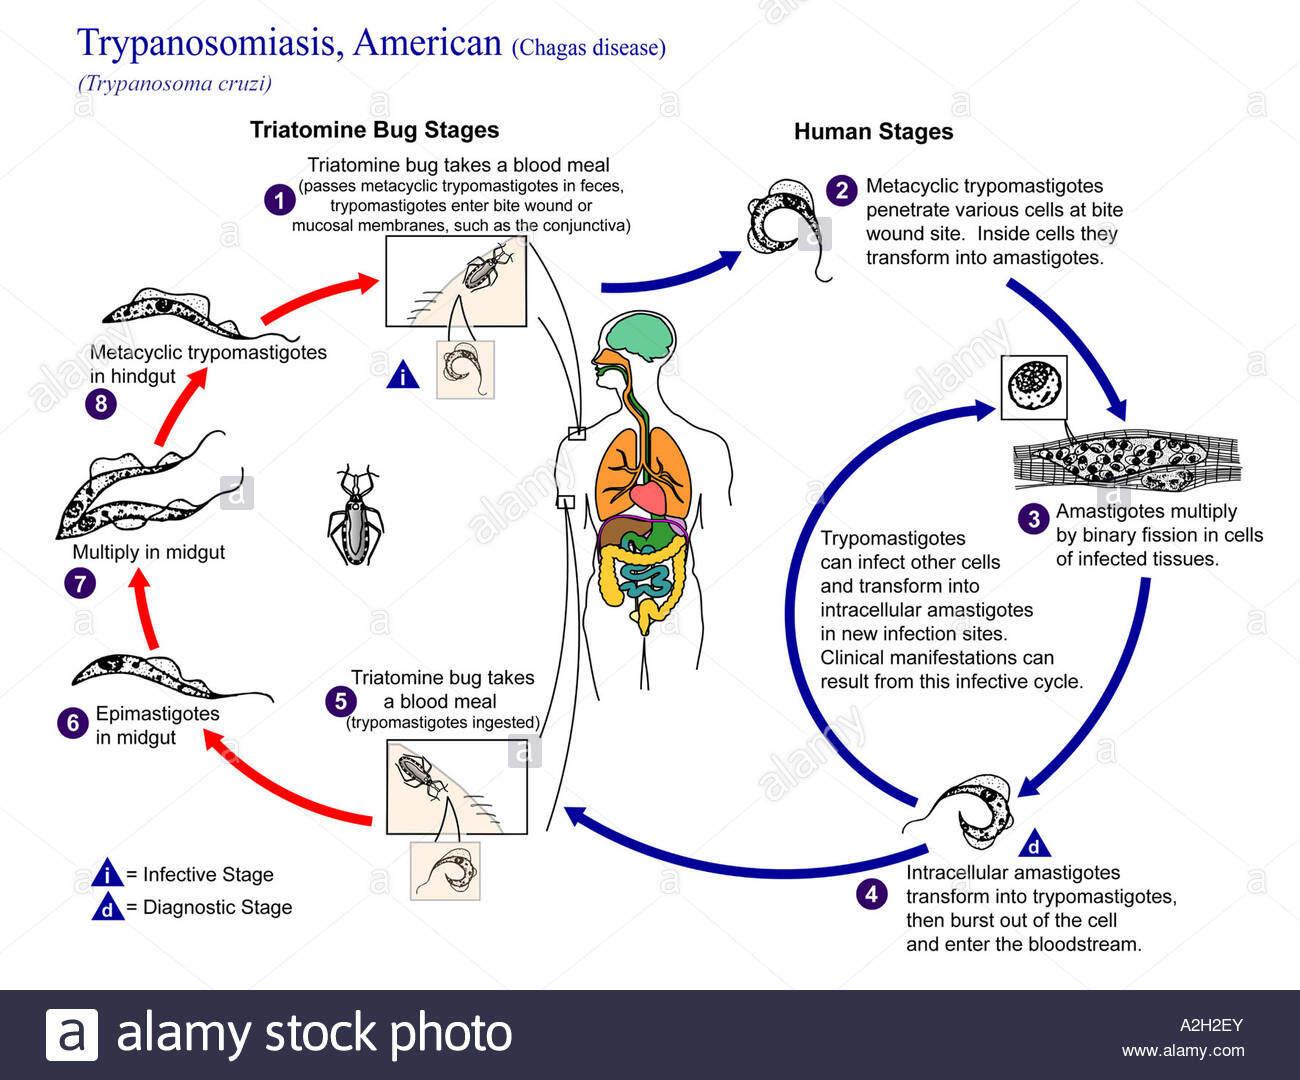 Life cycle of trypanosoma